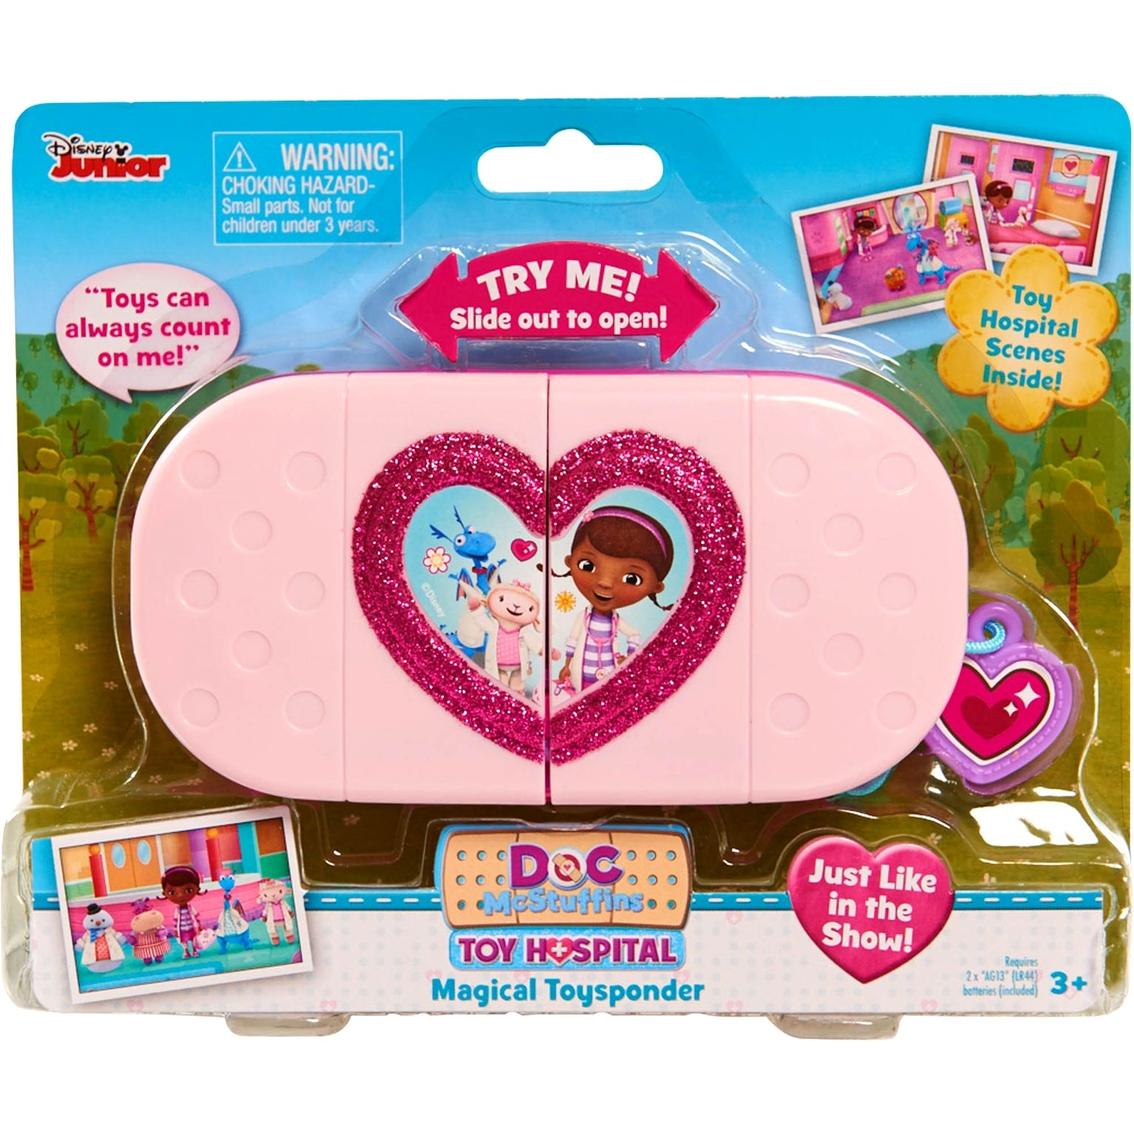 Disney Doc Mcstuffins Toy Hospital Magical | Pretend Play